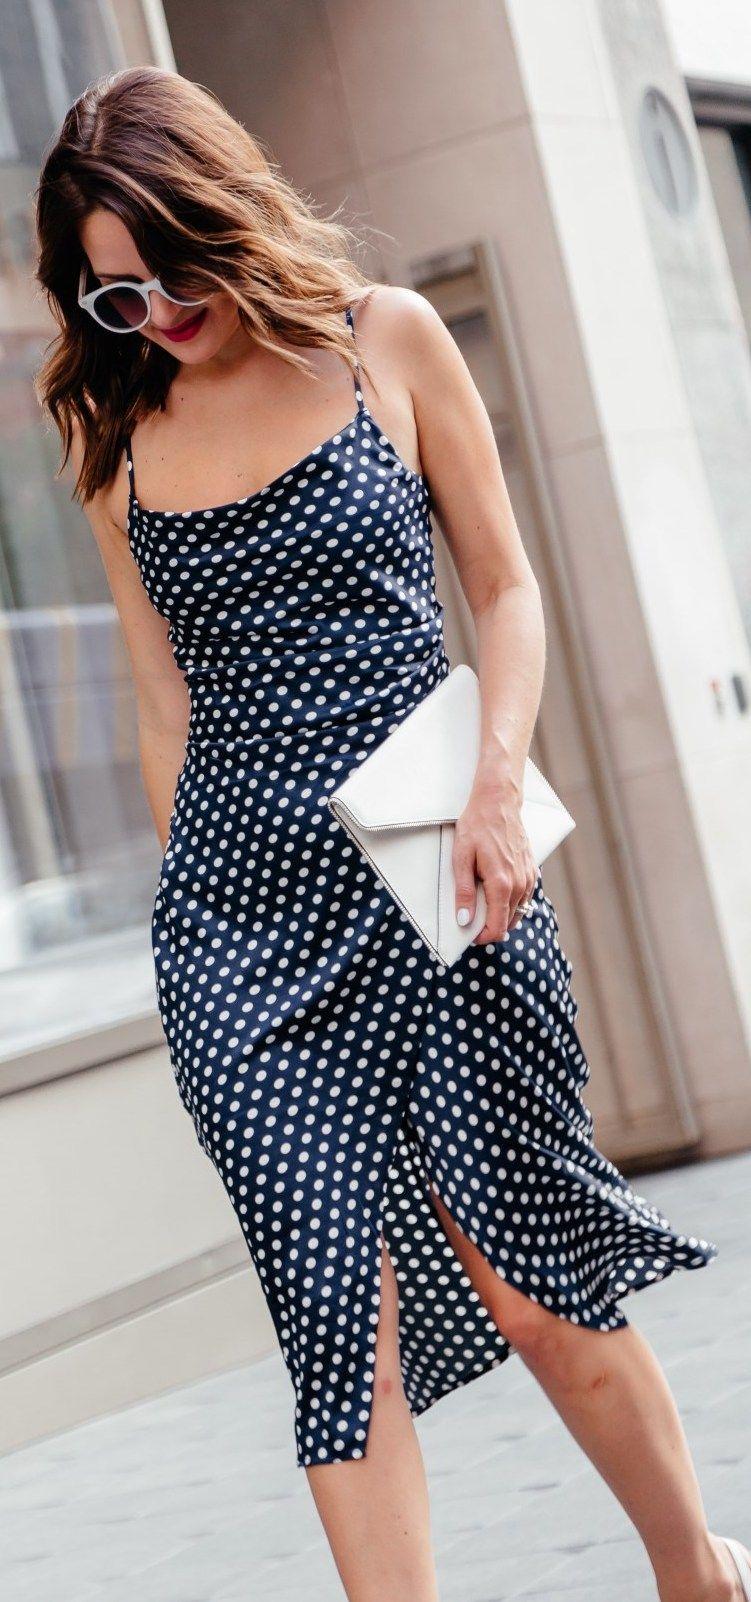 Summer Slip Dress Summer Slip Dress Polka Dress Bad Girl Clothes [ 1602 x 751 Pixel ]